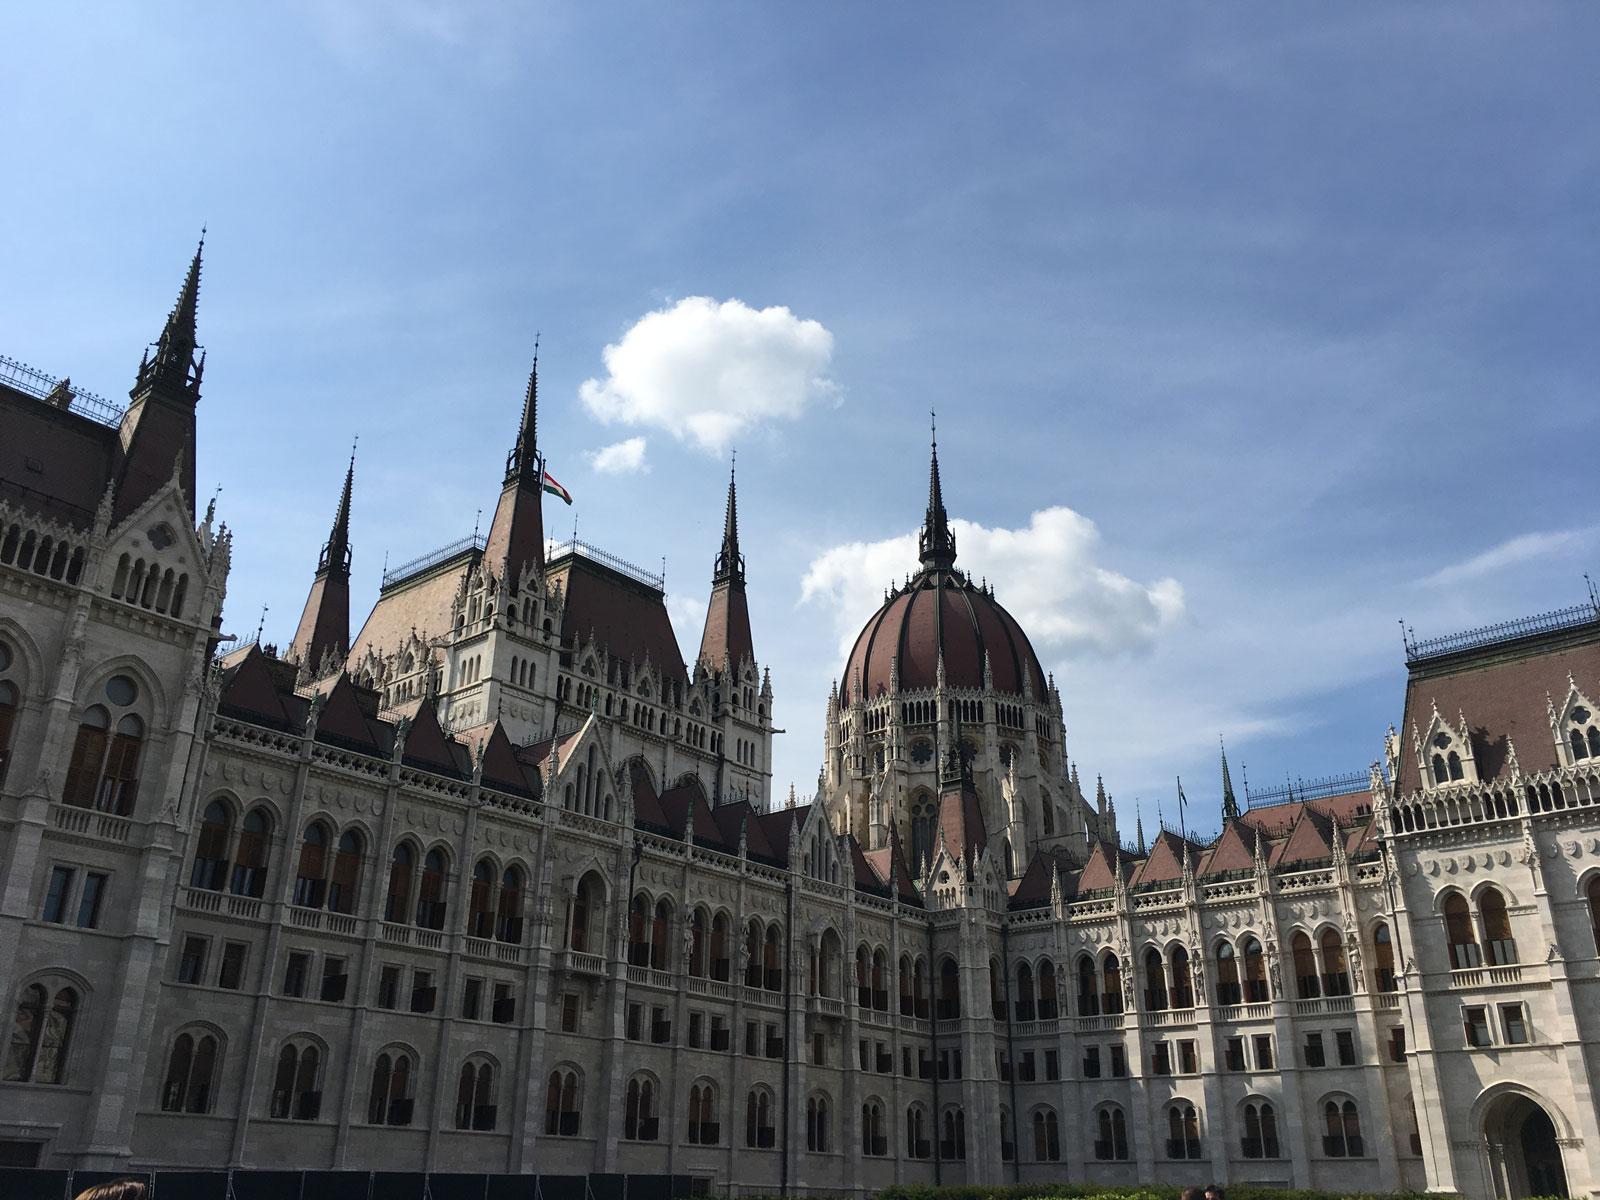 budapest_parliament4.jpg